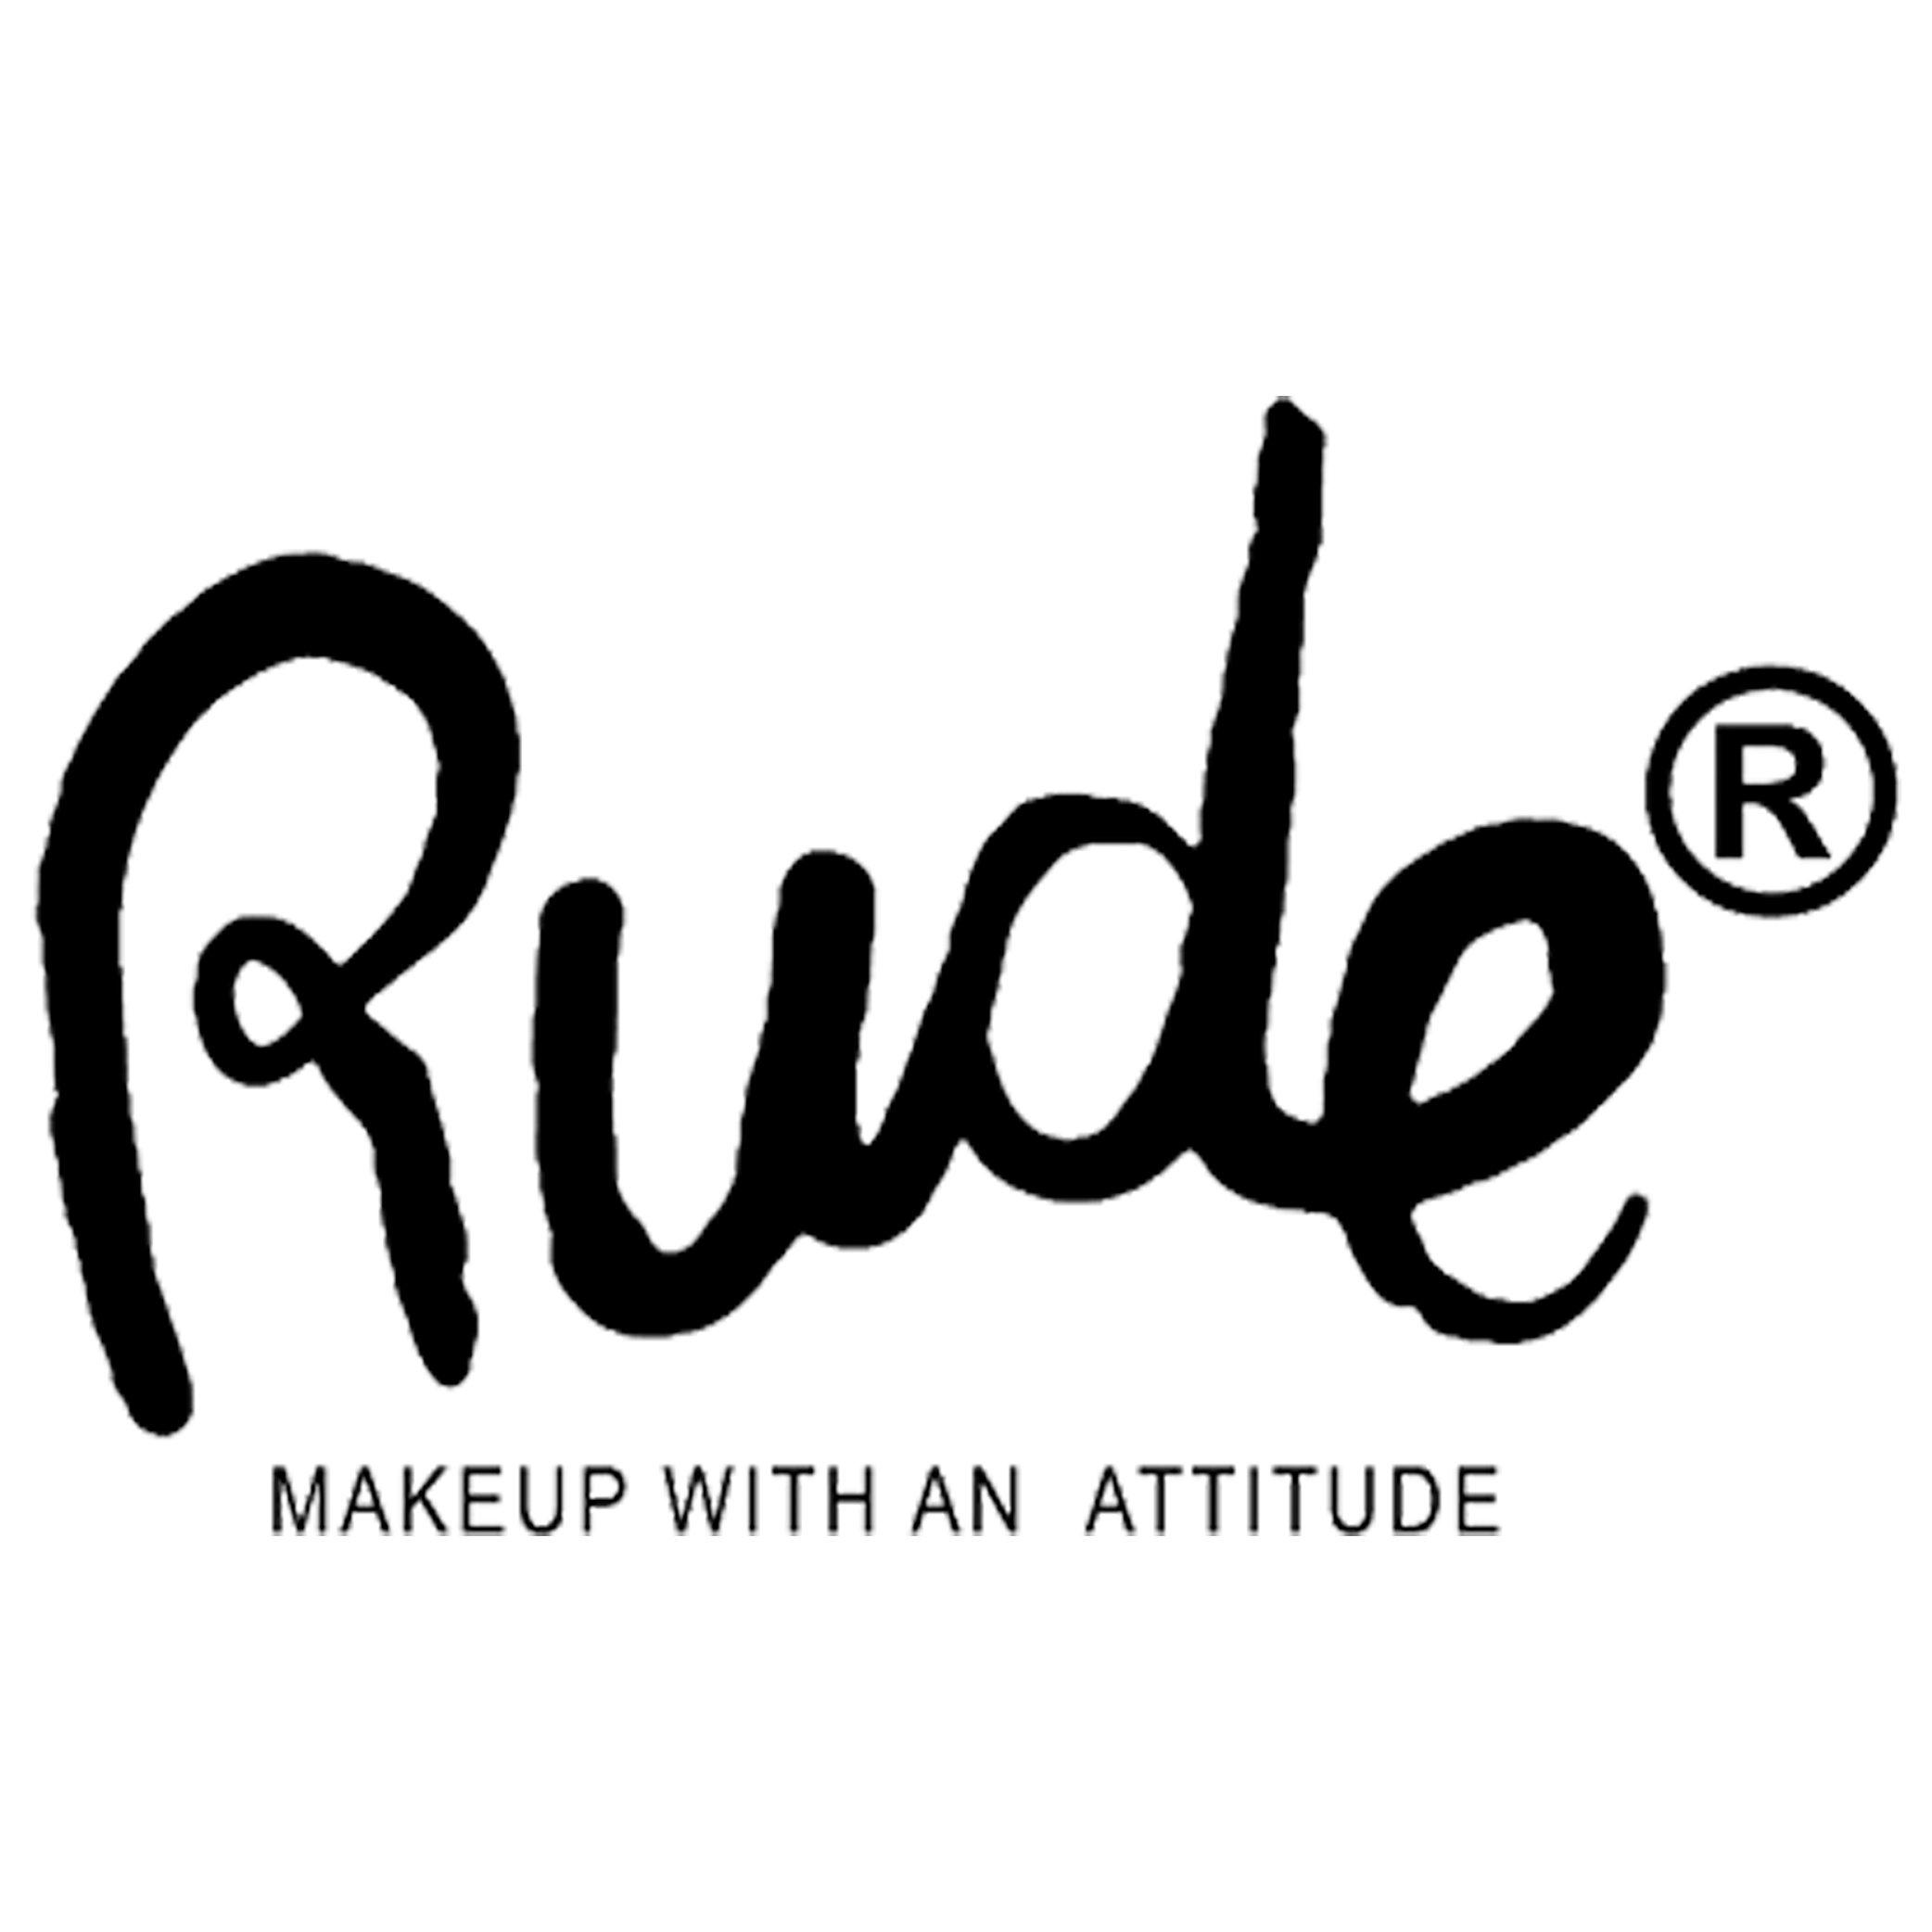 Rude Cosmetics' logo